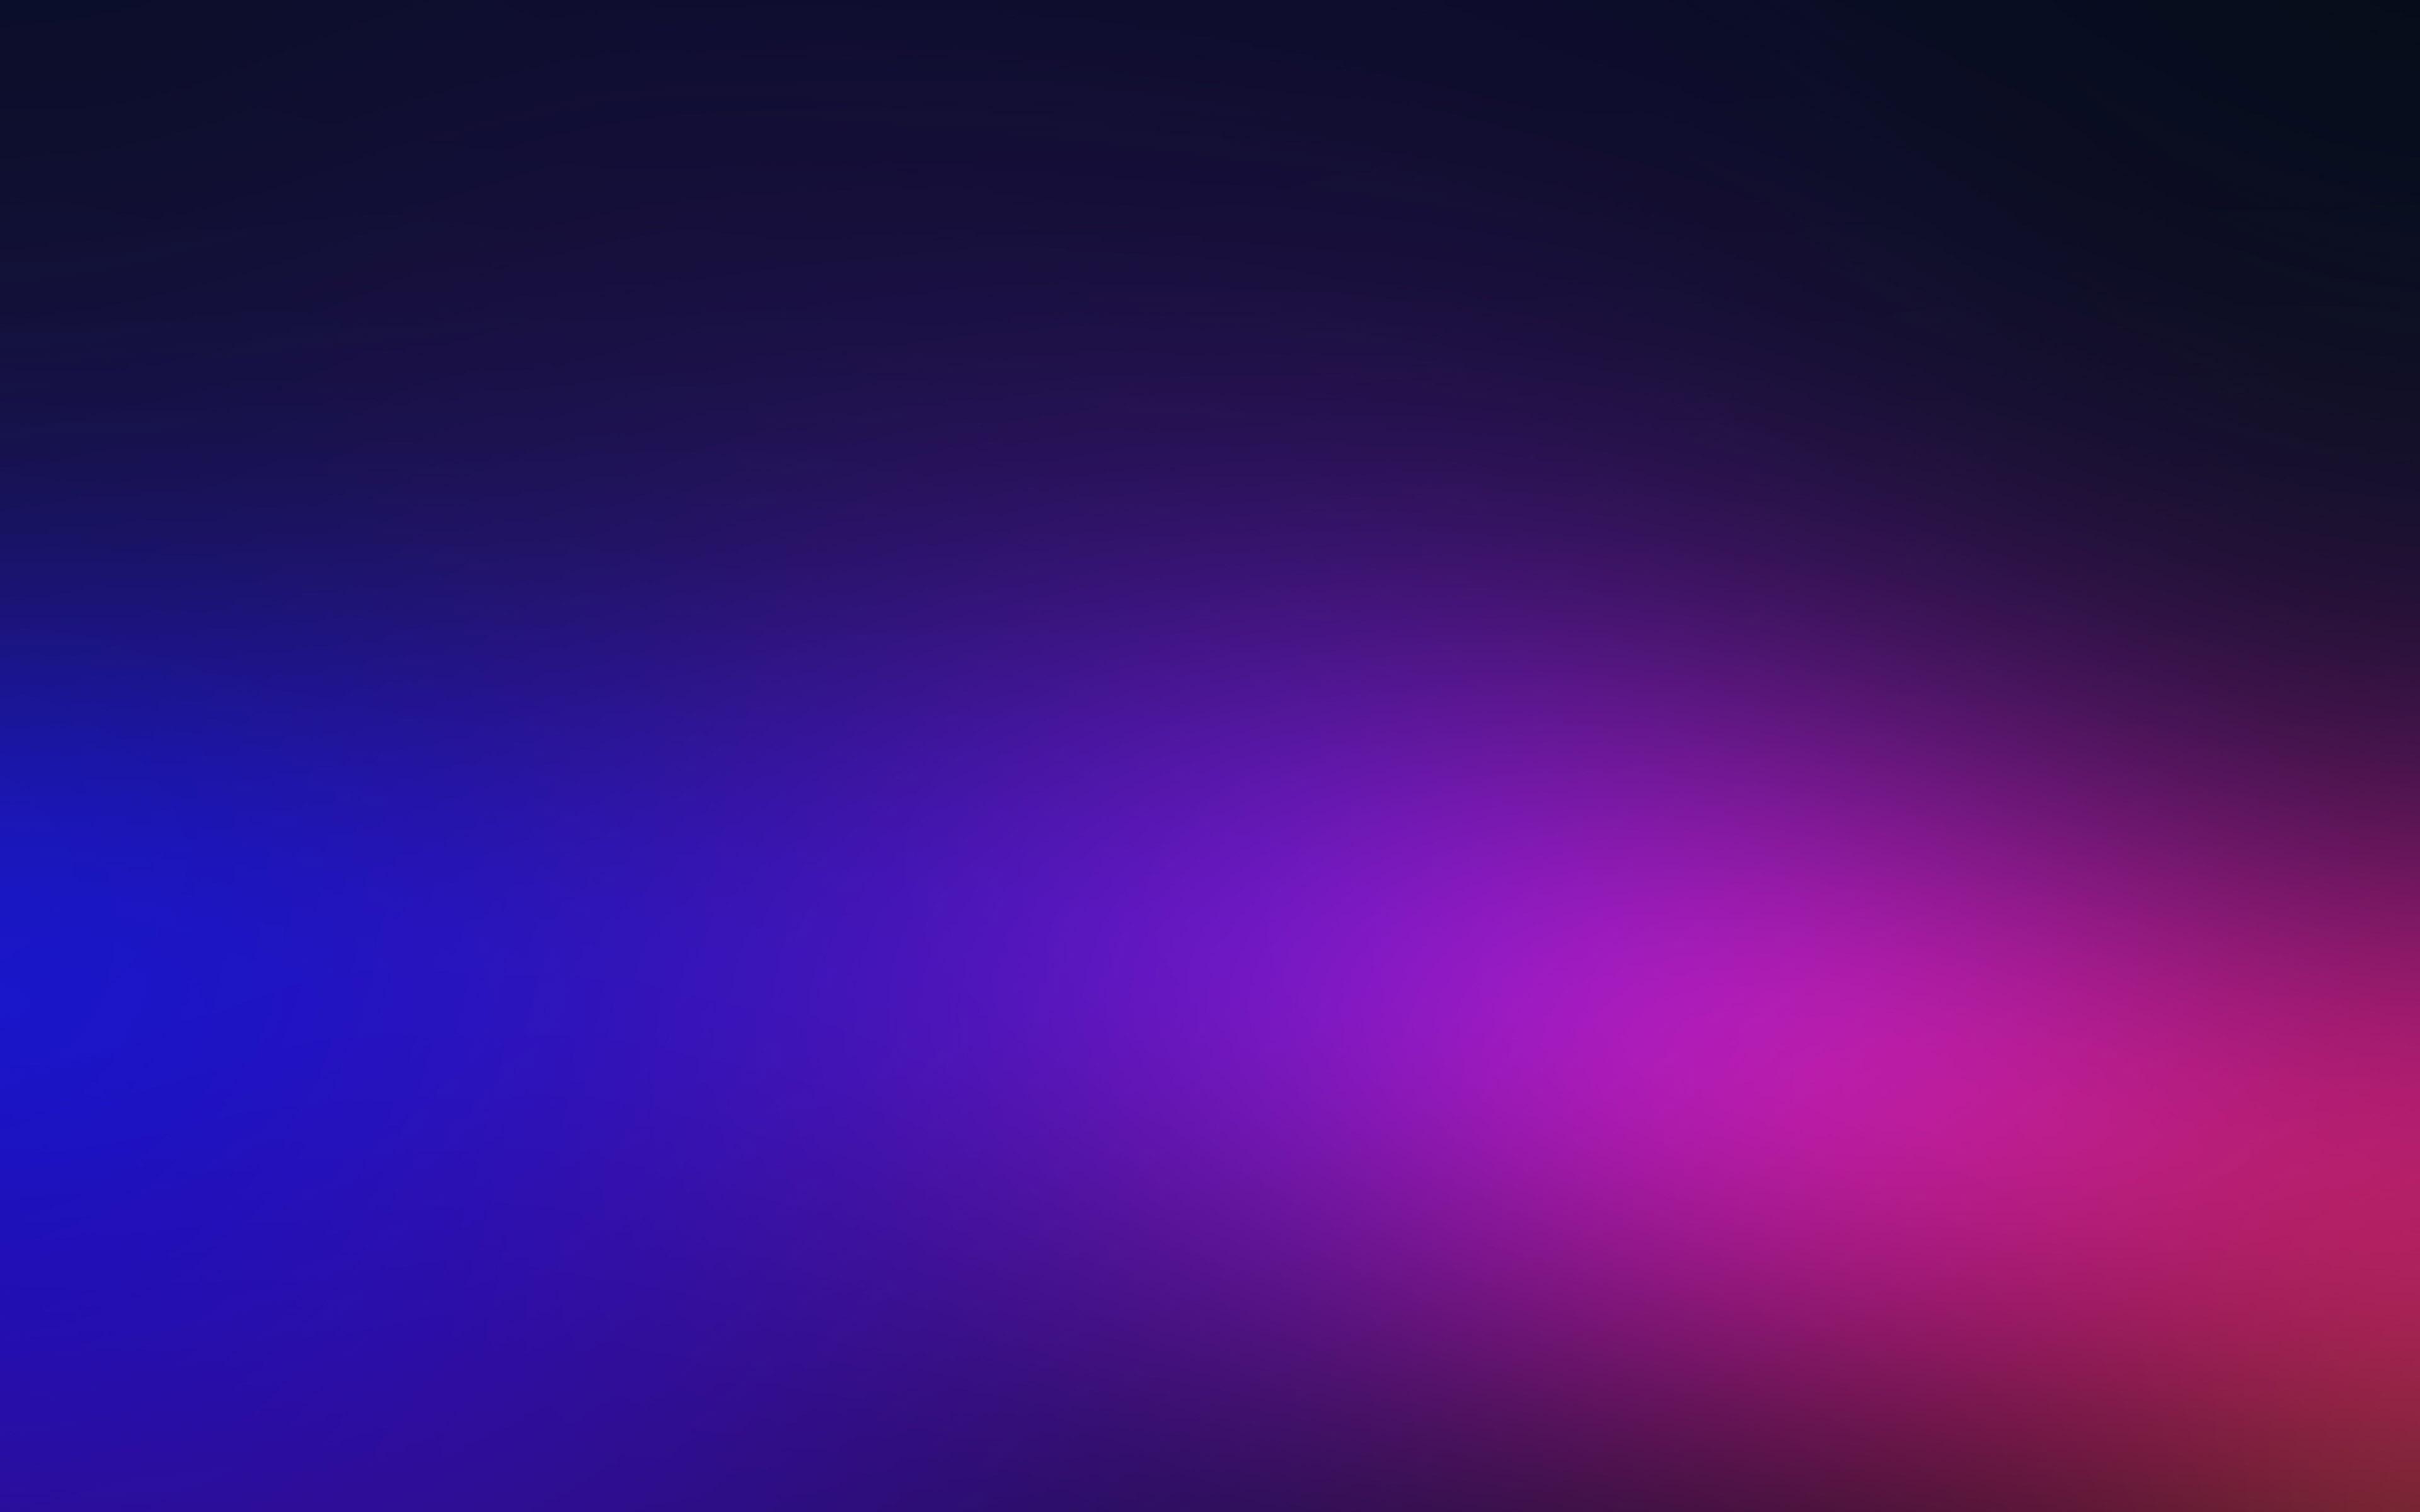 Wallpaper For Desktop Laptop Sc38 Sub Glow Blur